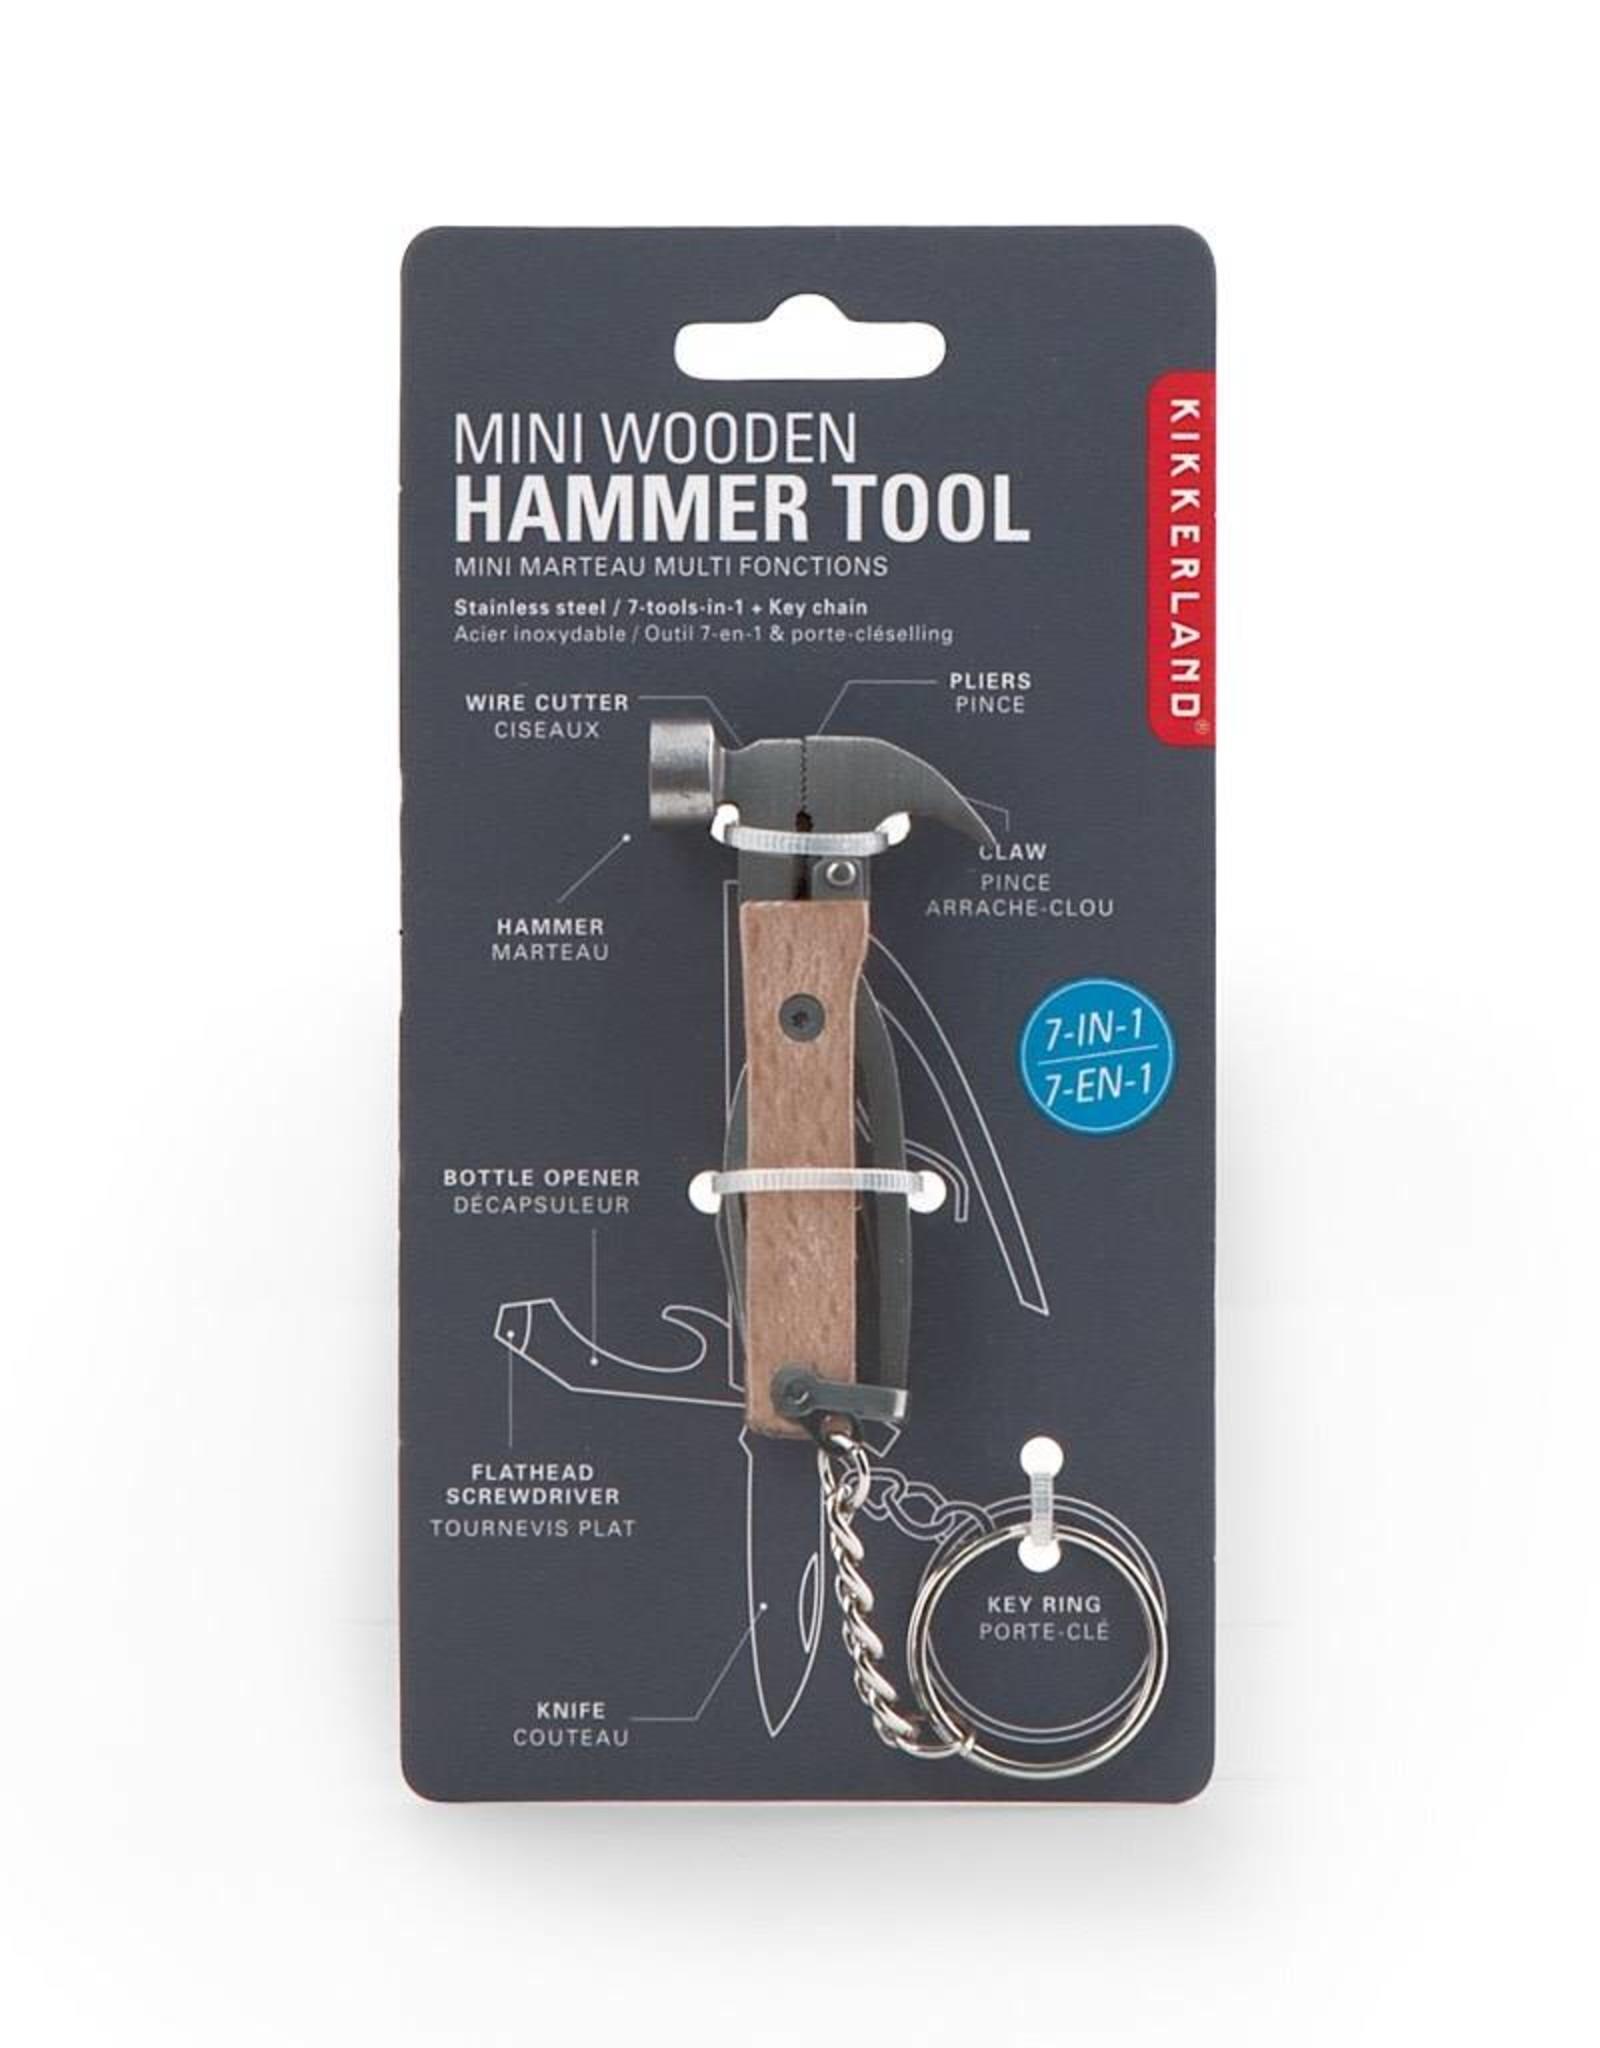 Kikkerland KR13-W Mini Wooden Hammer Tool Keychain